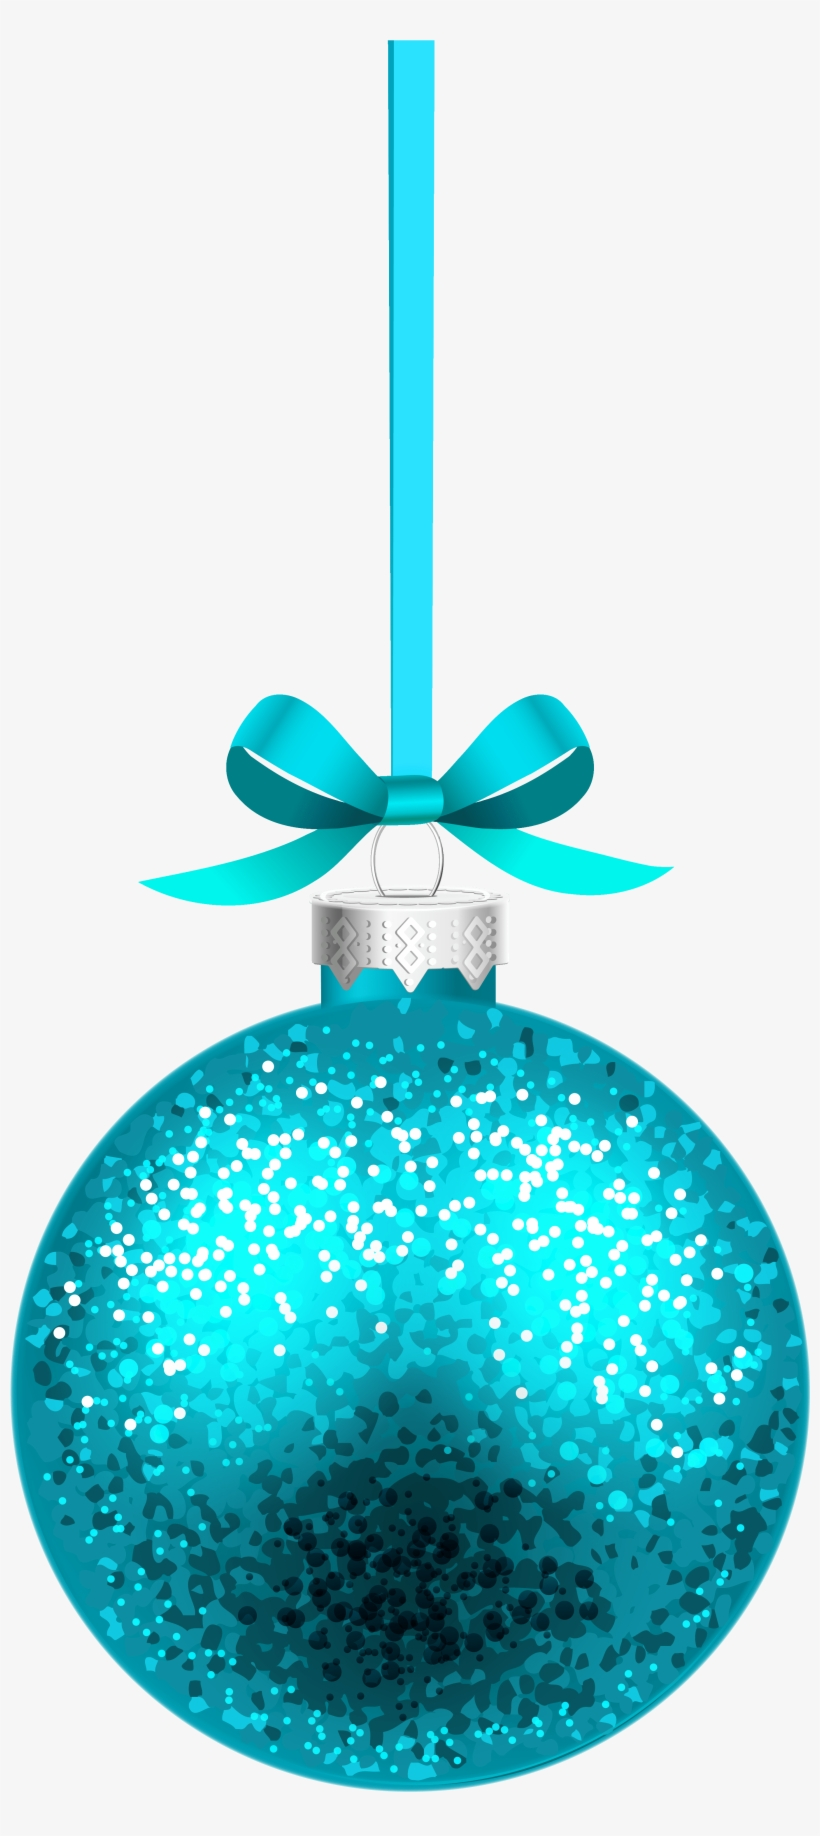 Esferas de navidad clipart clip art royalty free download Blue Christmas Hanging Ball Png Clipart Image - Esferas De Navidad ... clip art royalty free download